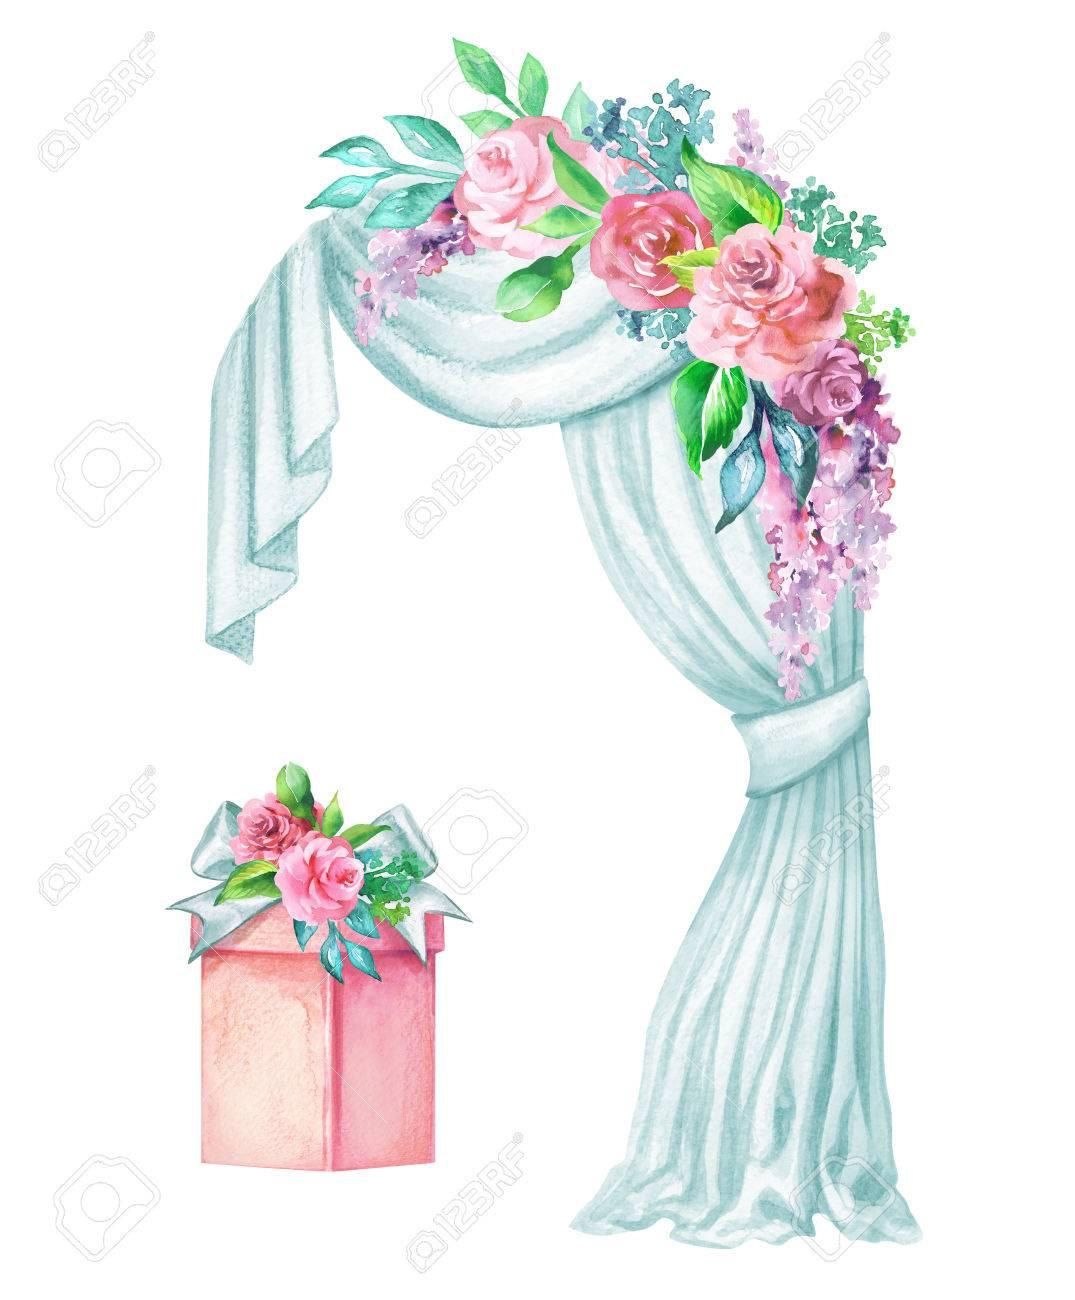 watercolor wedding illustration decorative arch window curtain